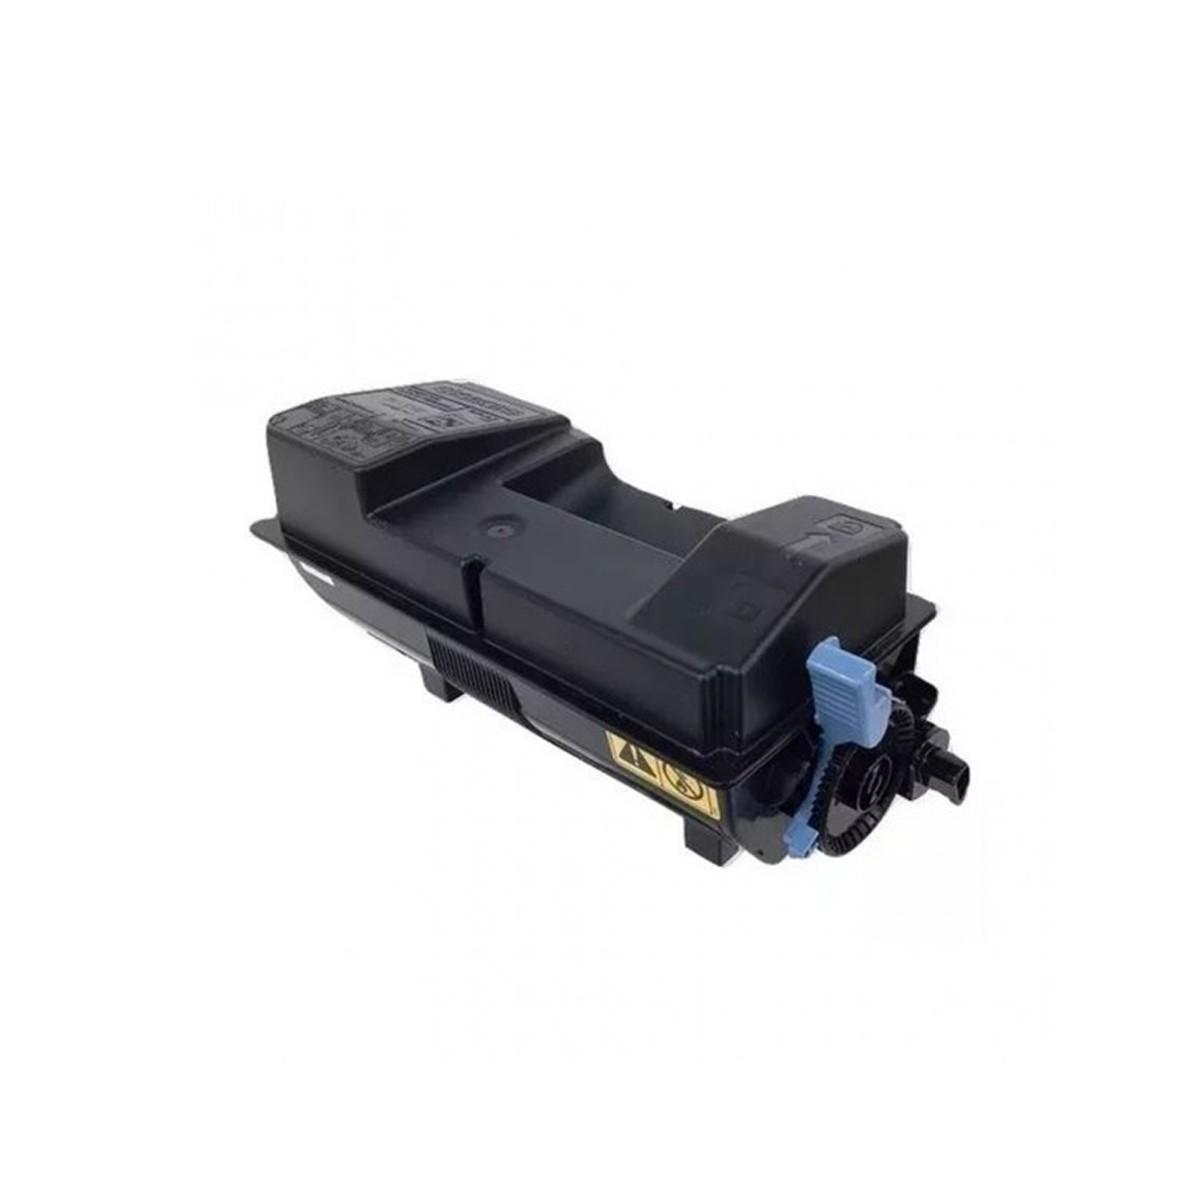 Toner Tk3182 3182 Ecosys P3055 M3655 - 21k